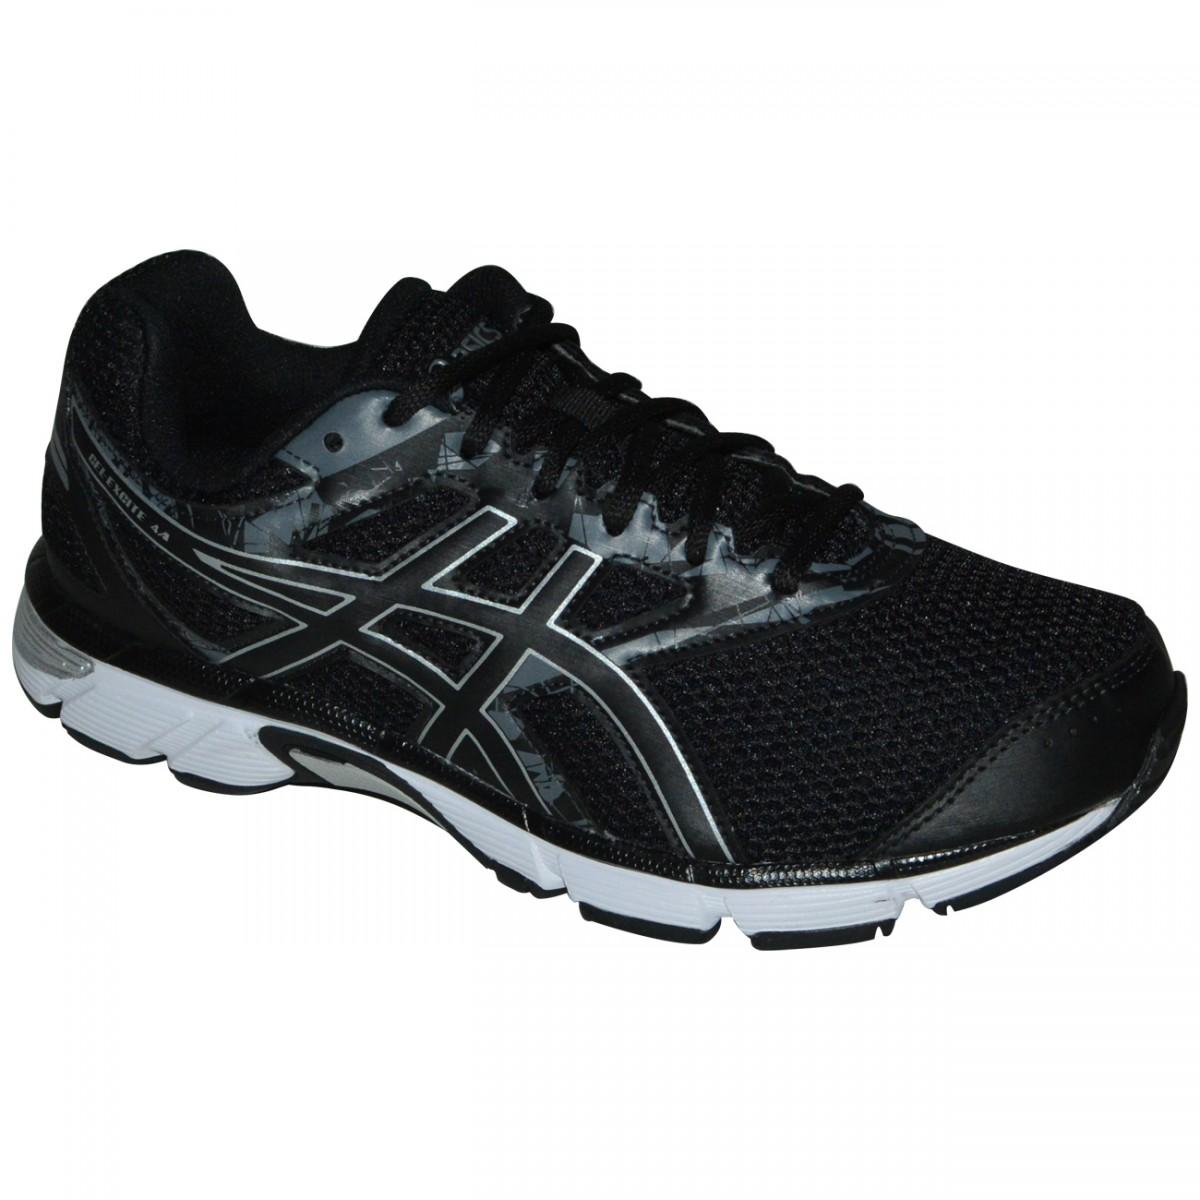 30315175e9 Tenis Asics Gel-Excite 4 T020A 8990 - Preto Branco - Chuteira Nike ...